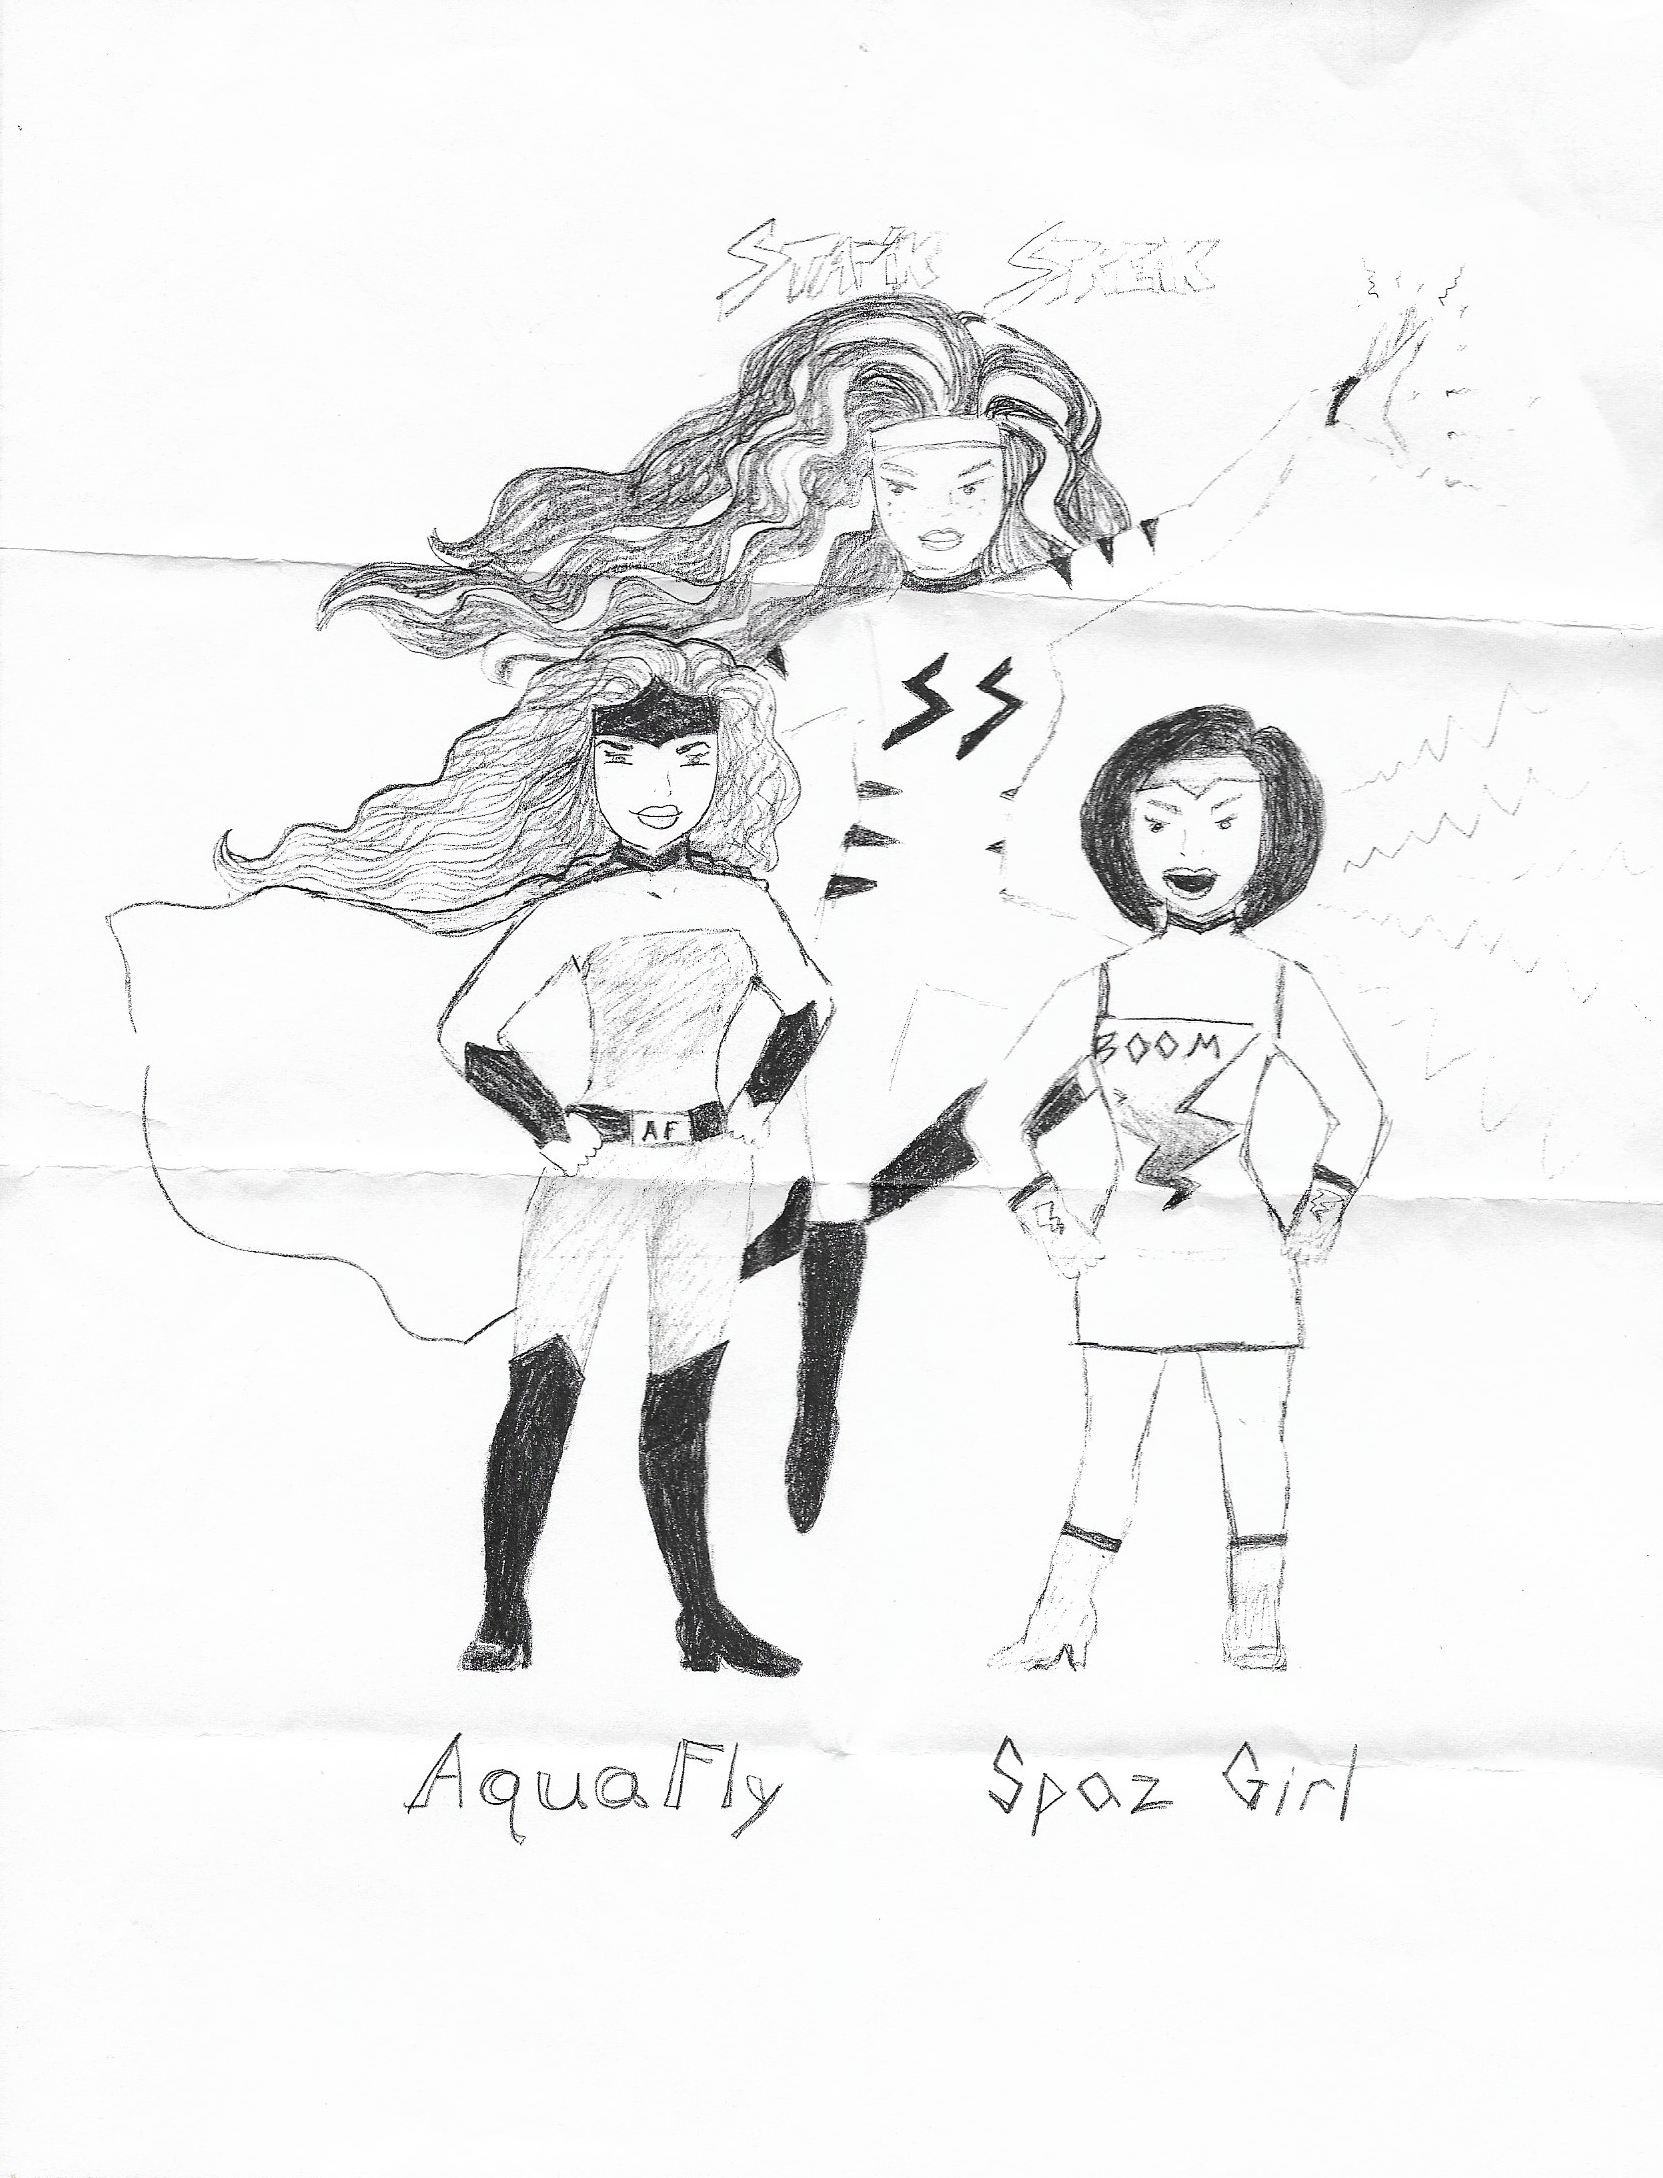 Our mutant alter egos: Statik Streak, AquaFly and Spaz Girl. (I was Spaz Girl.)